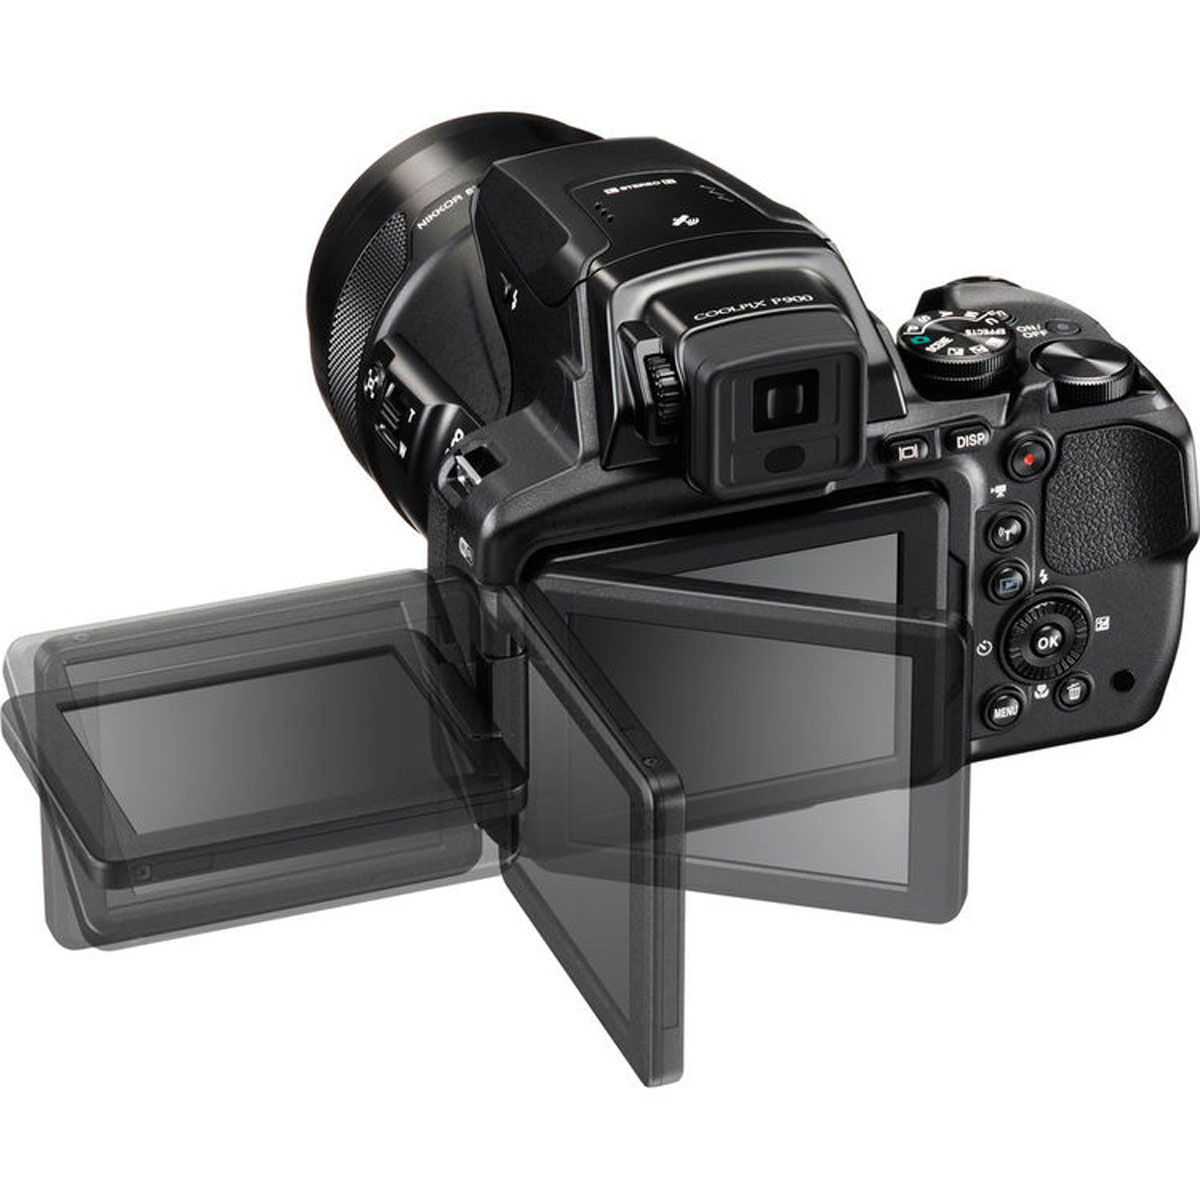 Nikon Coolpix P900, Blackцифровая фотокамера Nikon